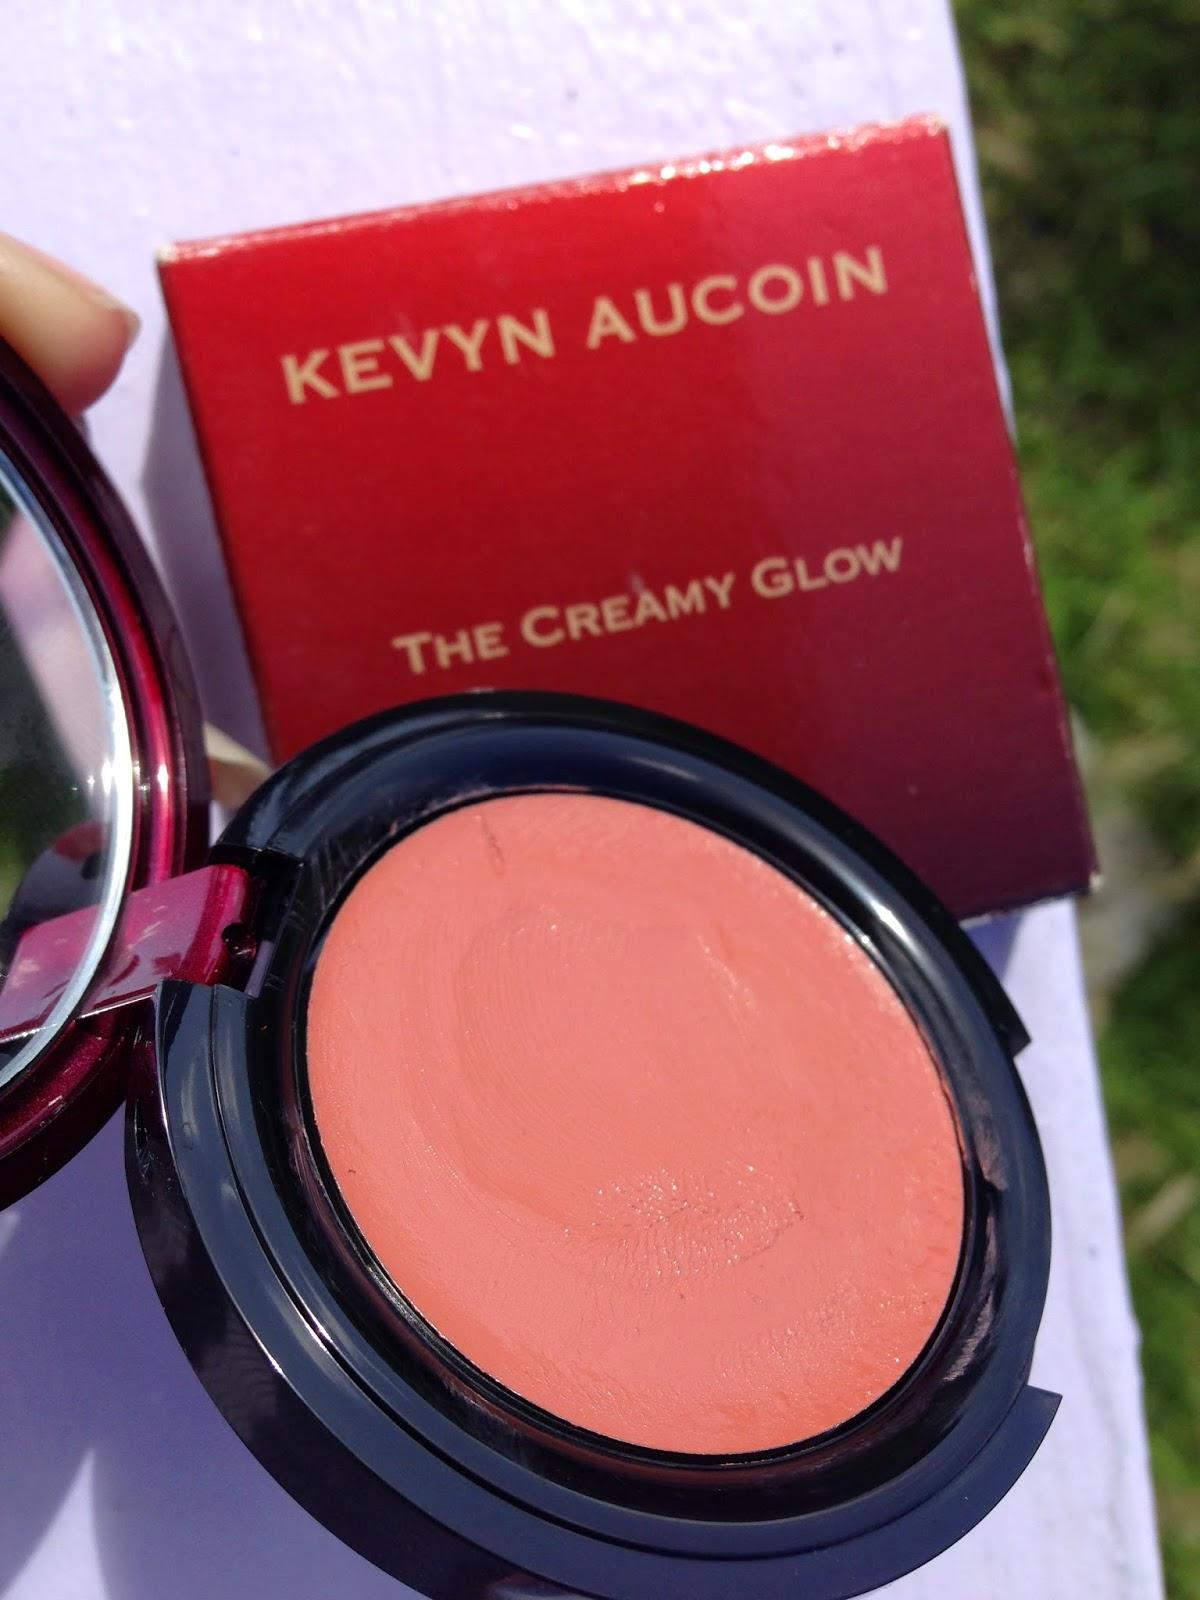 Kevyn Aucoin The Creamy Glow 'Euphoria' - www.modenmakeup.com